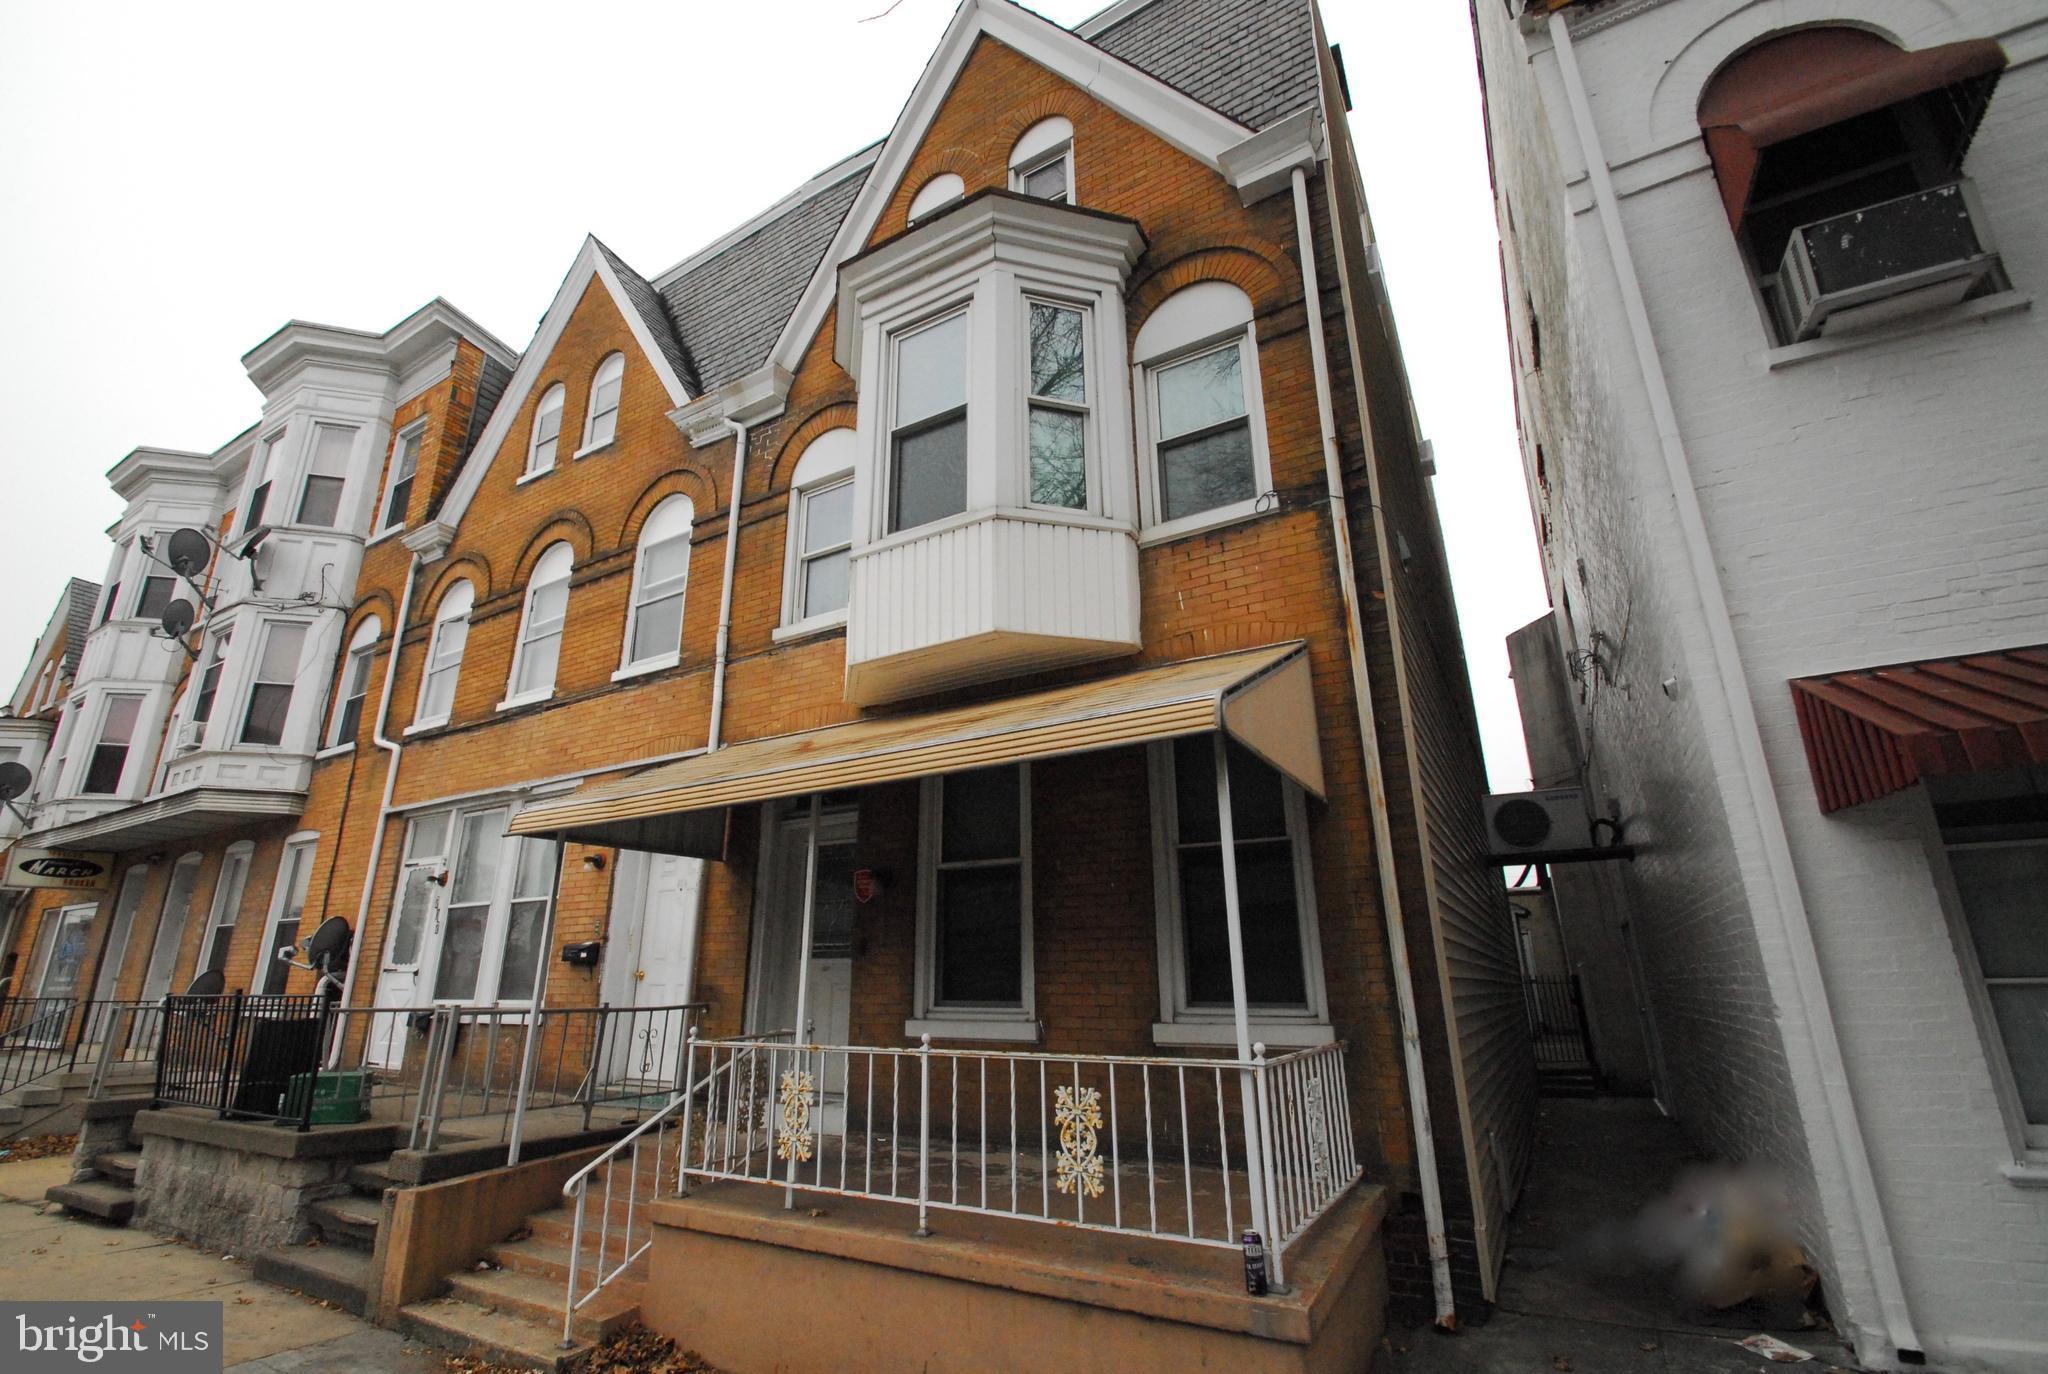 705 W Market Street, York, PA 17401